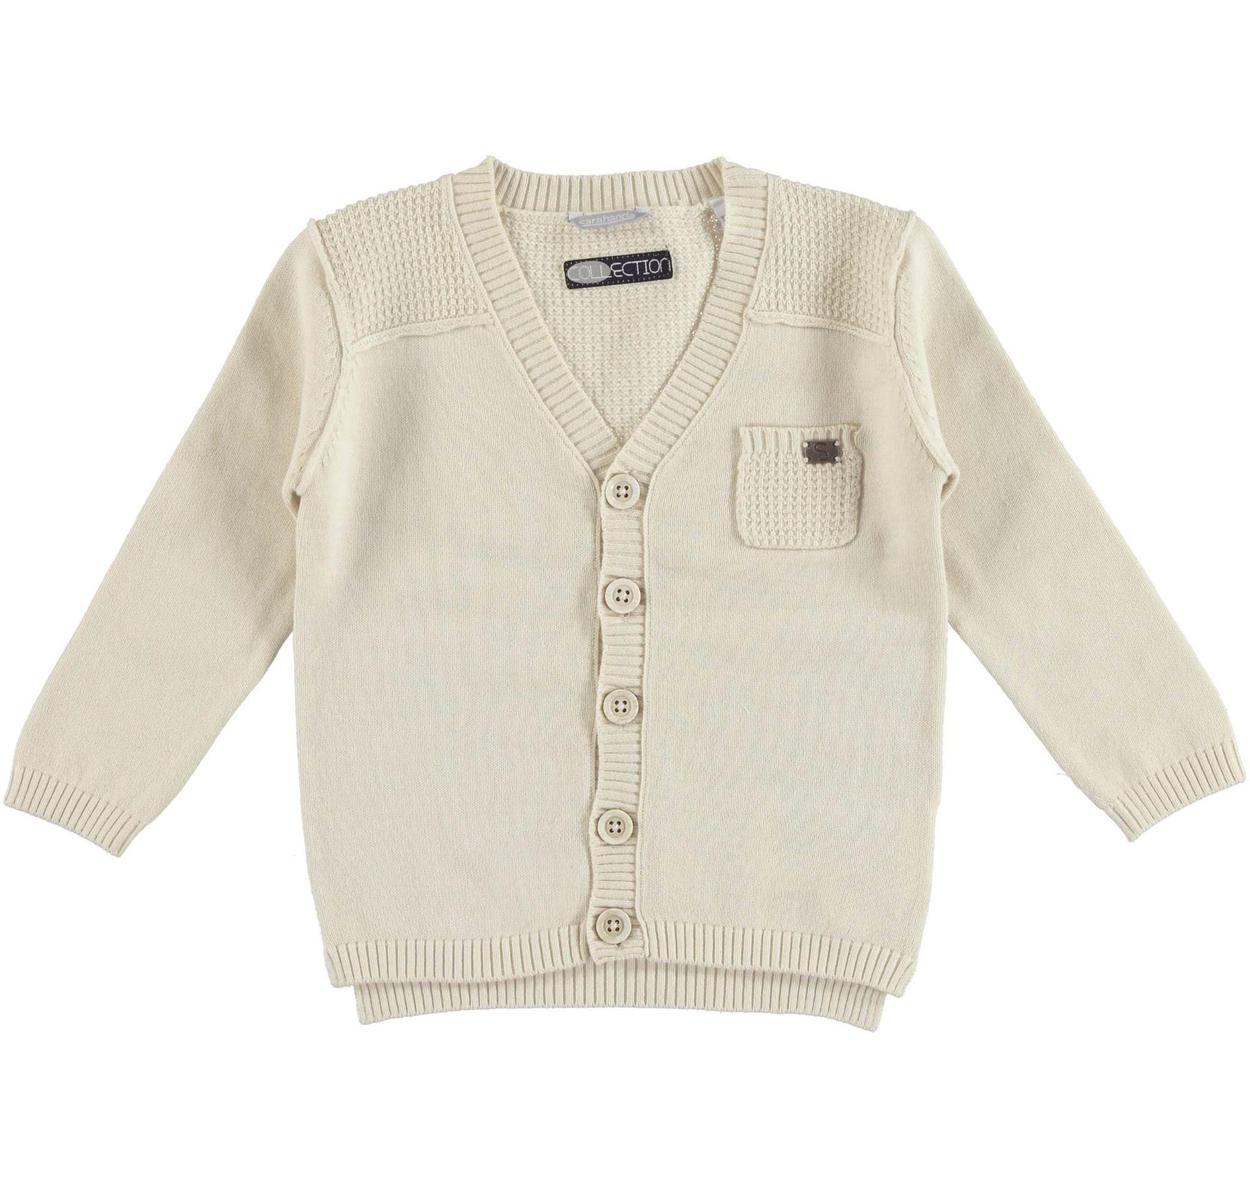 80ae1c4128c4 Versatile Sarabanda 100% cotton cardigan for boys from size 6 months ...